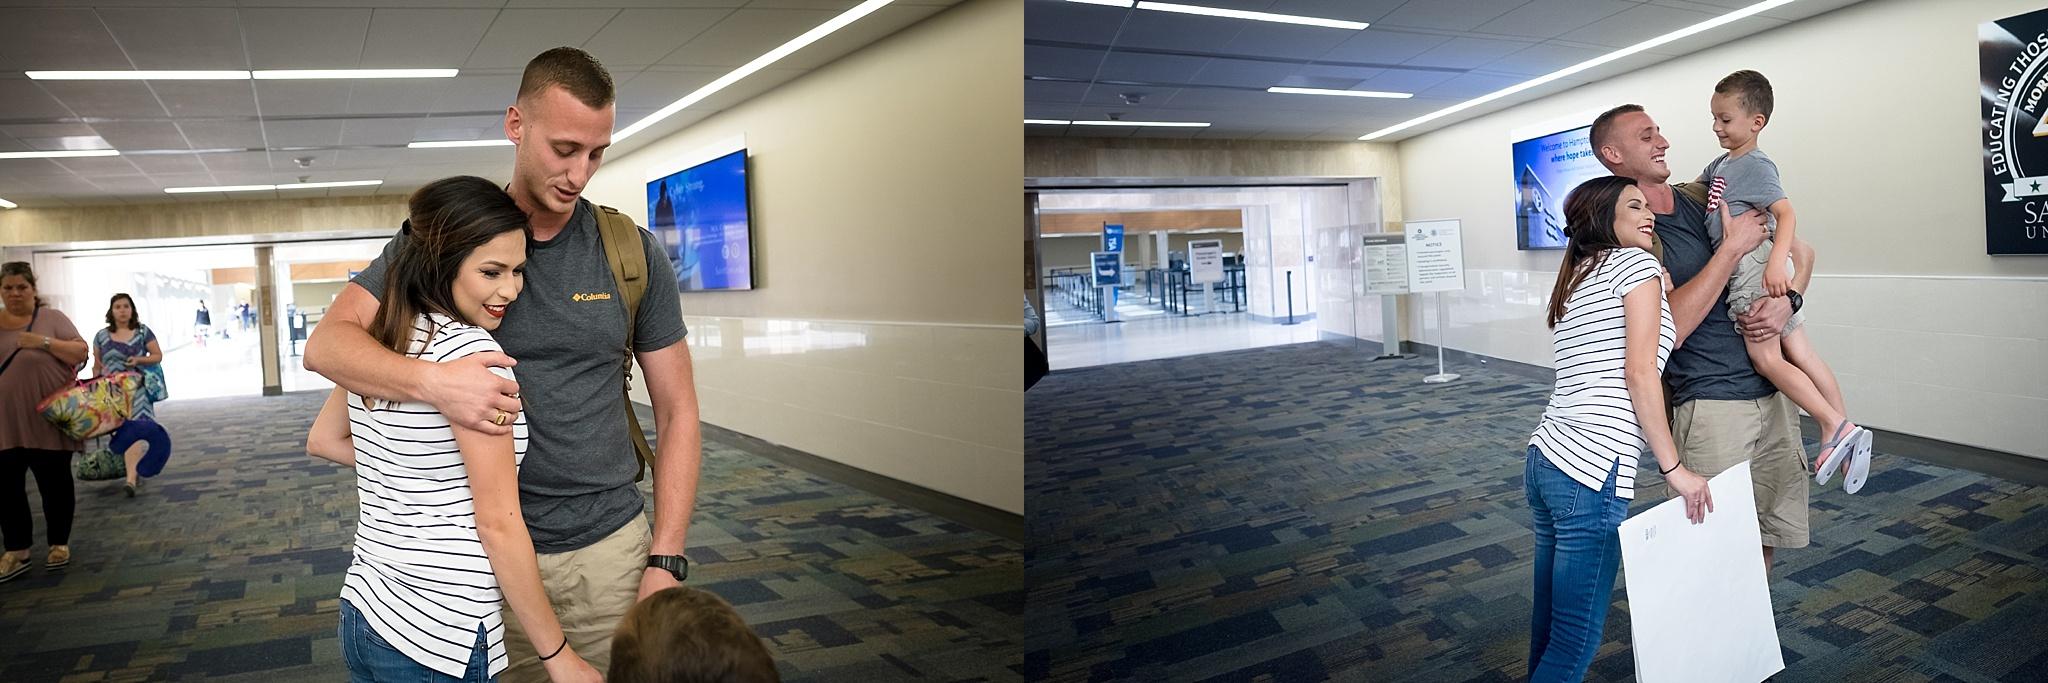 HM-15_Airport_Homecoming.jpg